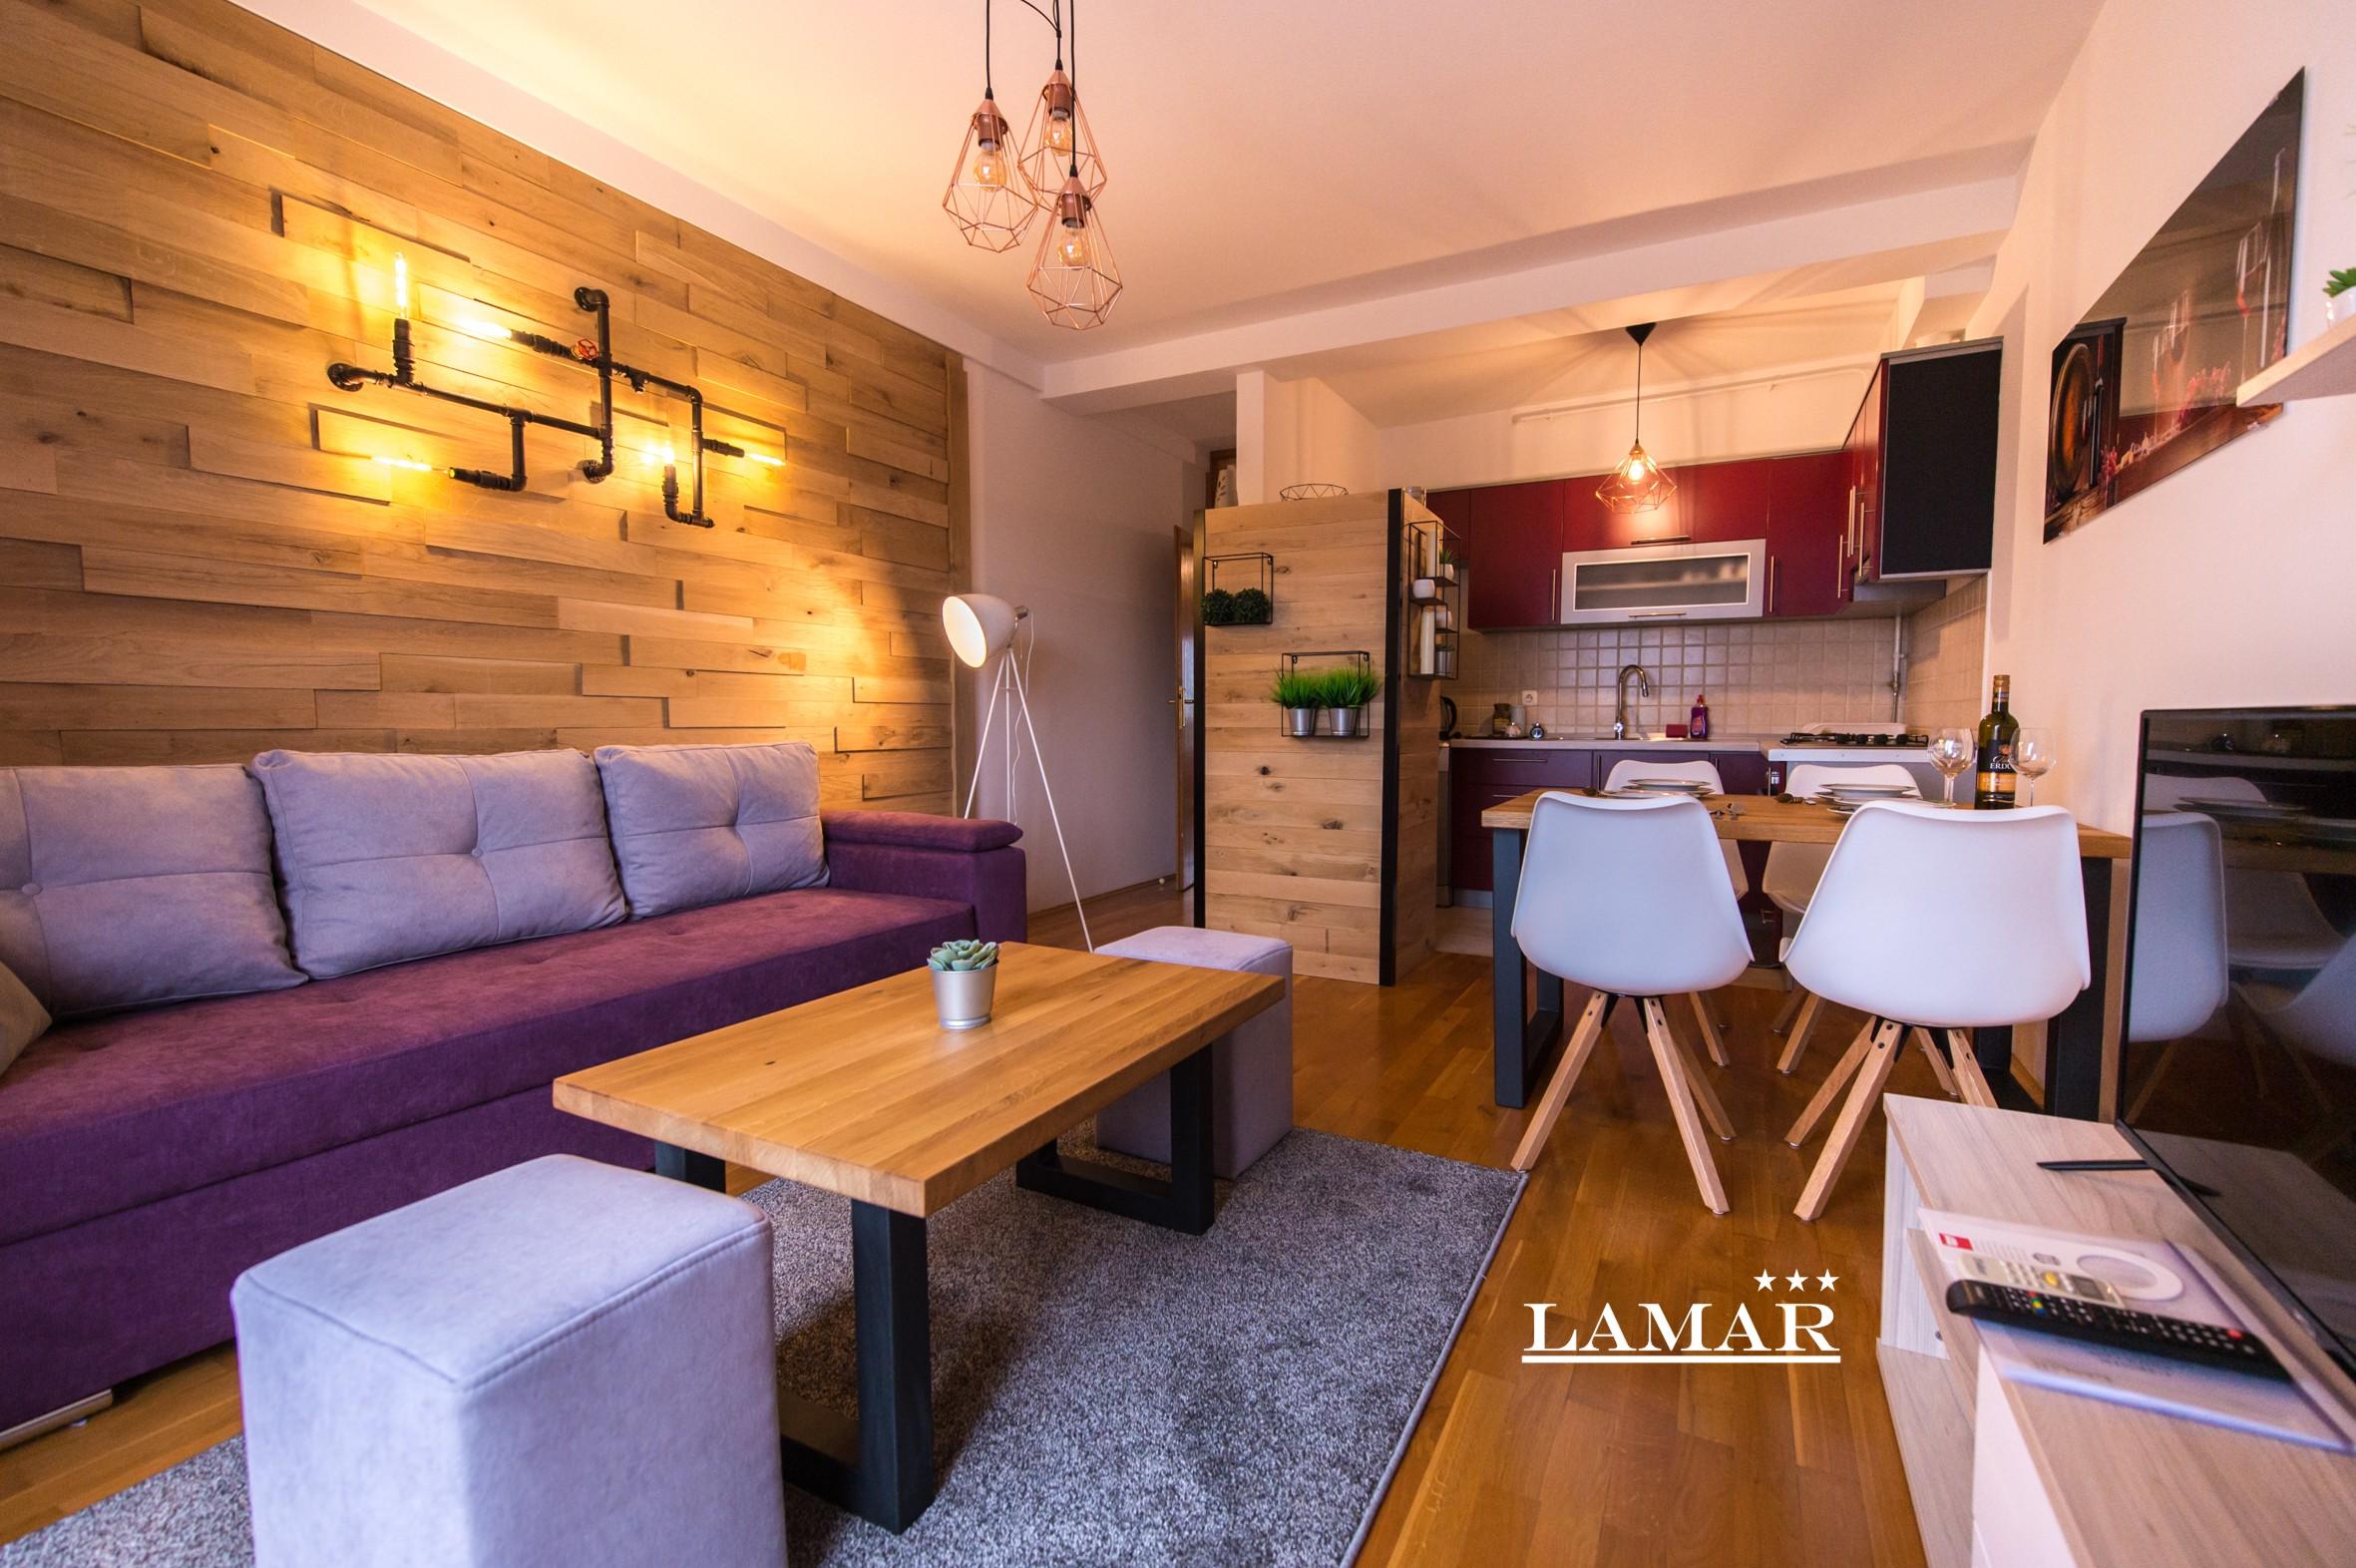 Apartmani Lamar